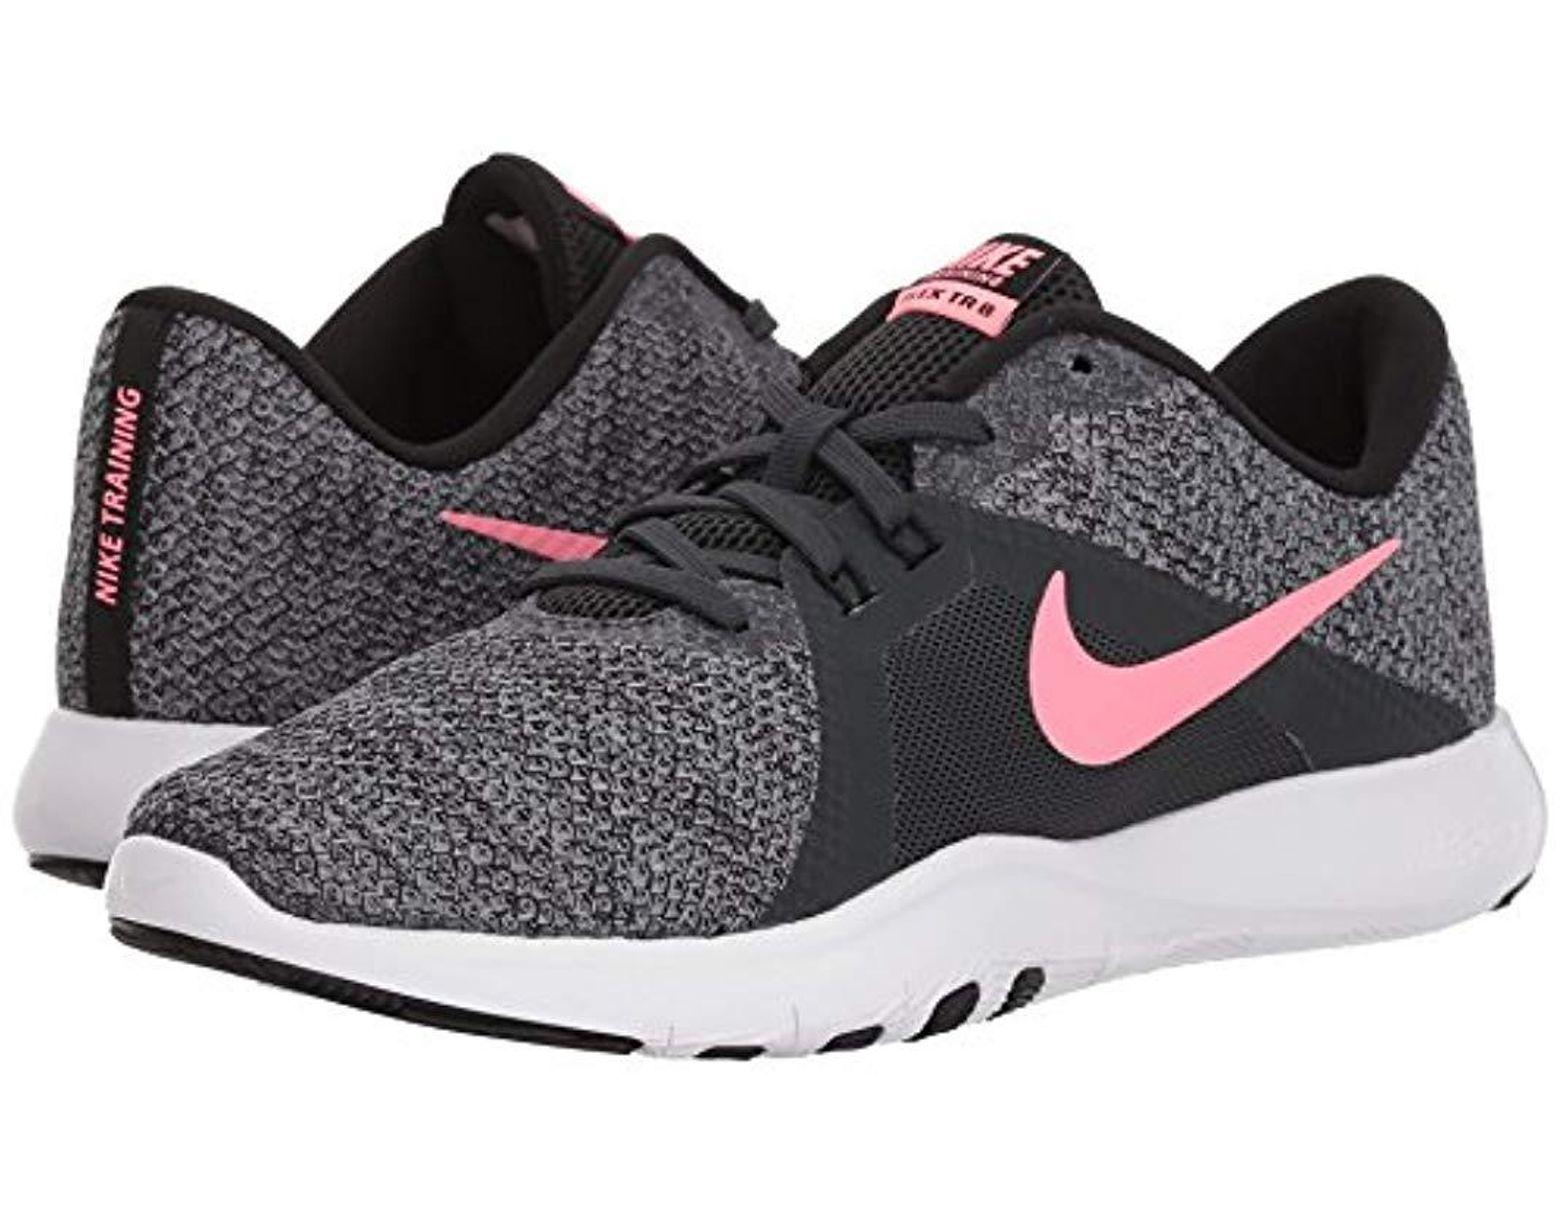 wholesale dealer 23557 1dc40 Nike. Women s Black Flex Trainer 8 Cross